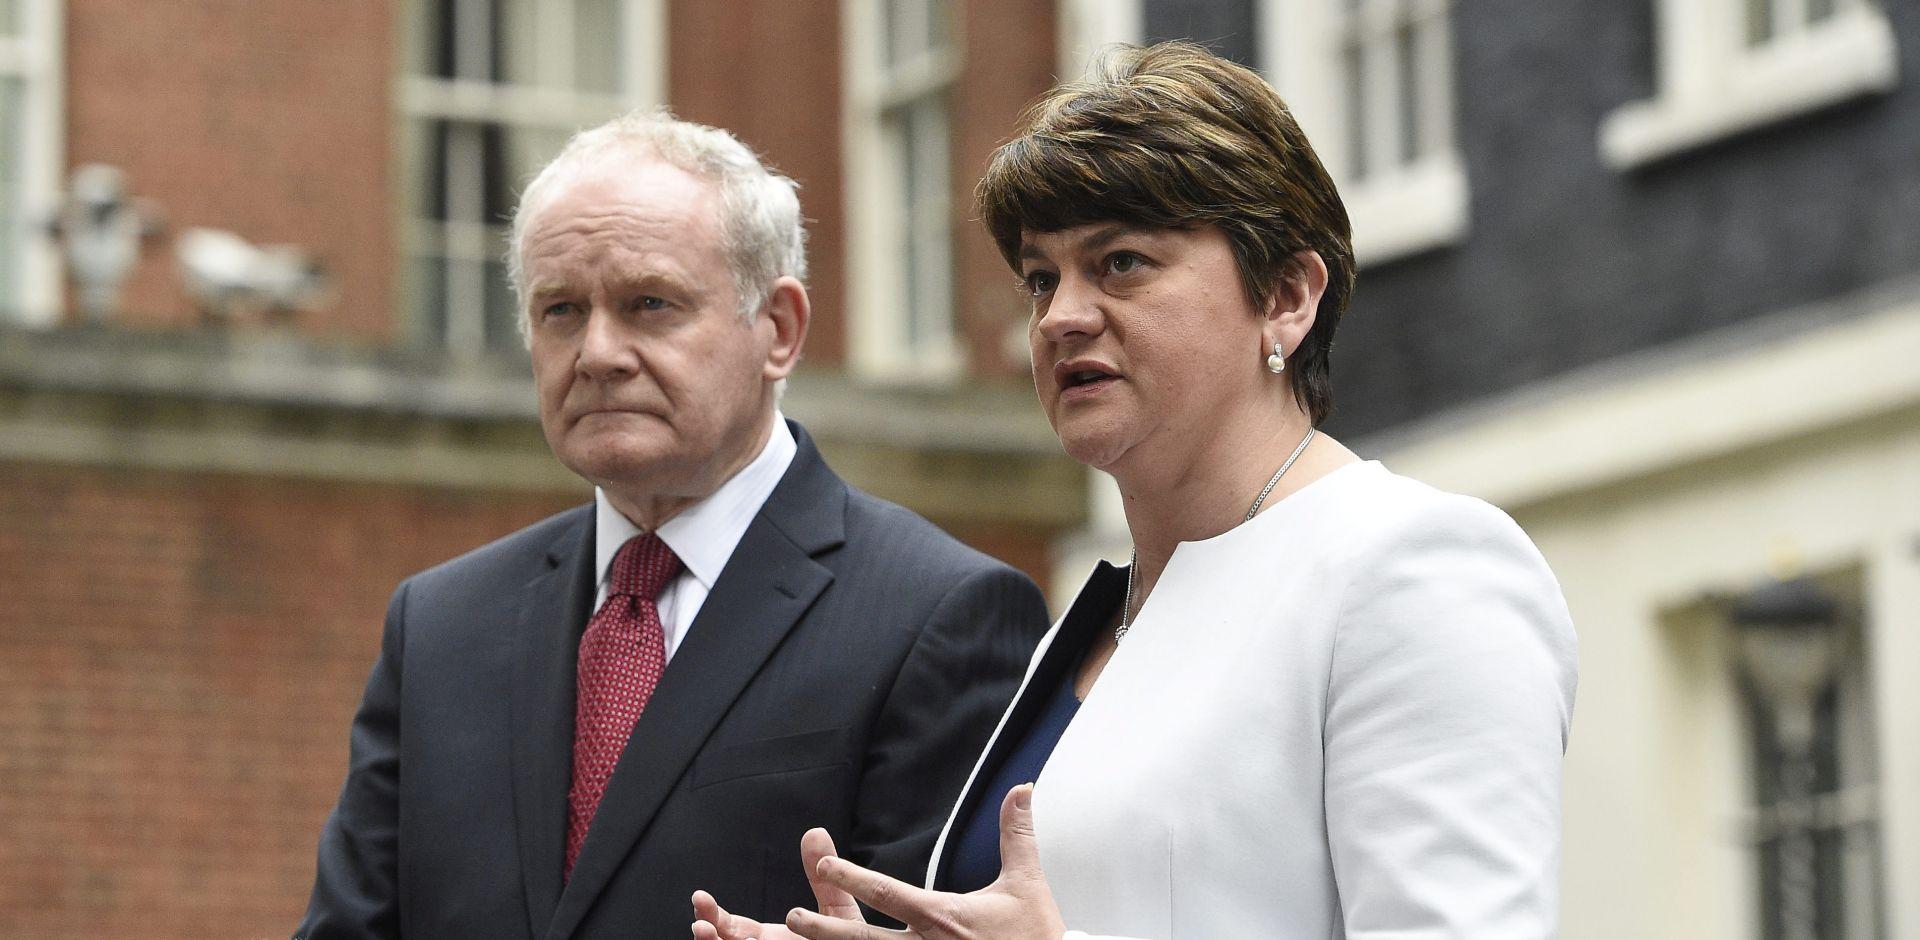 SJEVERNA IRSKA Izbori s političkom krizom i Brexitom u pozadini